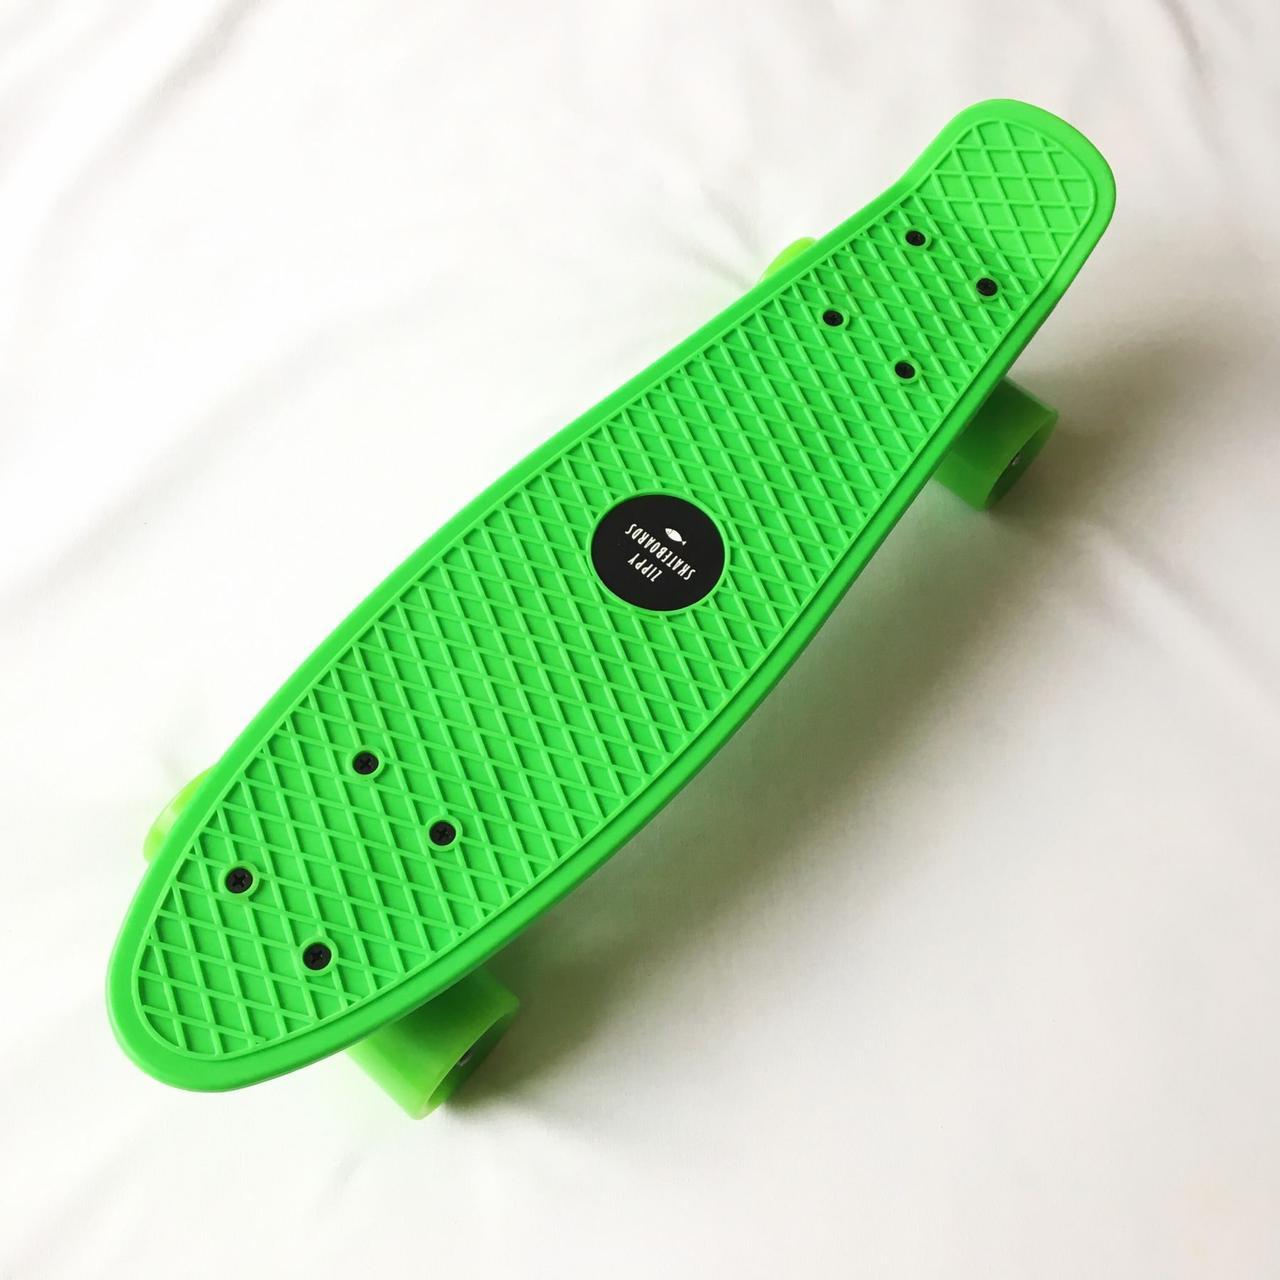 "Penny Board Green 22"" - Салатовый 54 см пенни борд"